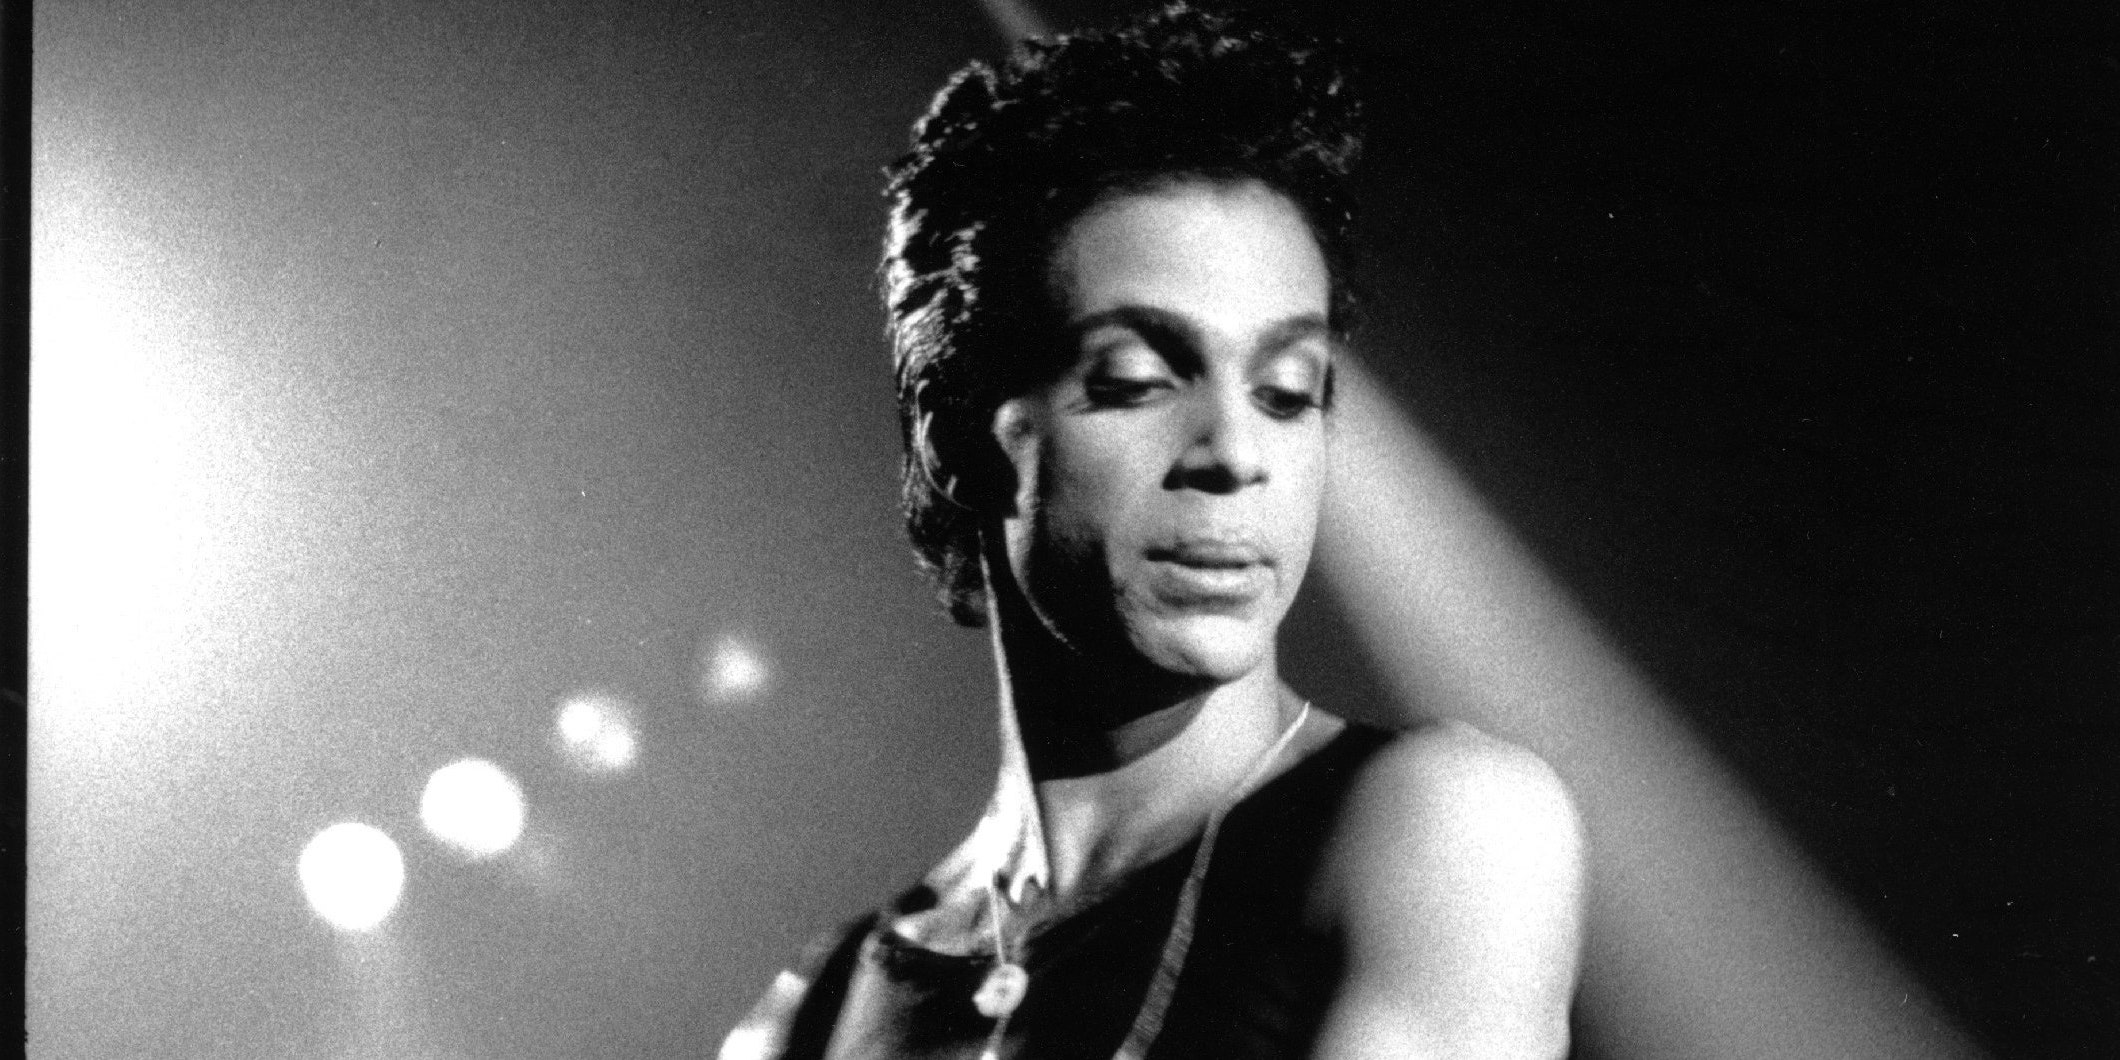 prince-cosmic-day-unreleased-single